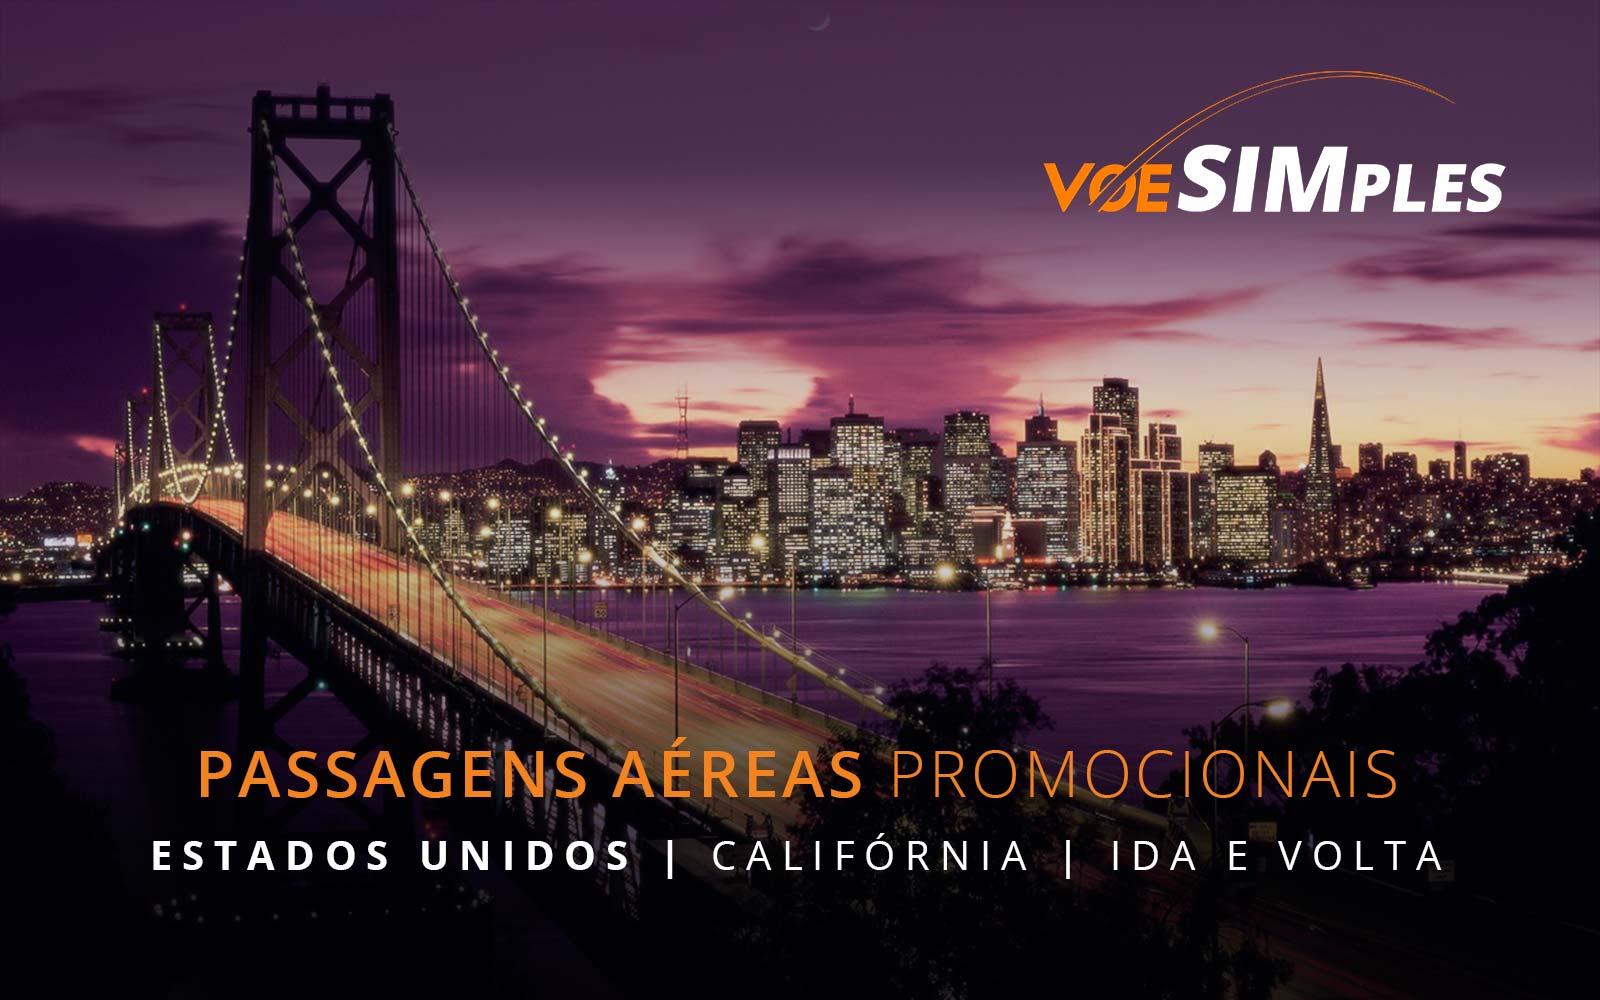 passagens-aereas-promocionais-eua-voe-simples-passagens-aereas-baratas-promocao-passagem-aviao-estados-unidos-los-angeles-palm-springs-sacramento-san-diego-san-francisco-san-jose-santa-ana